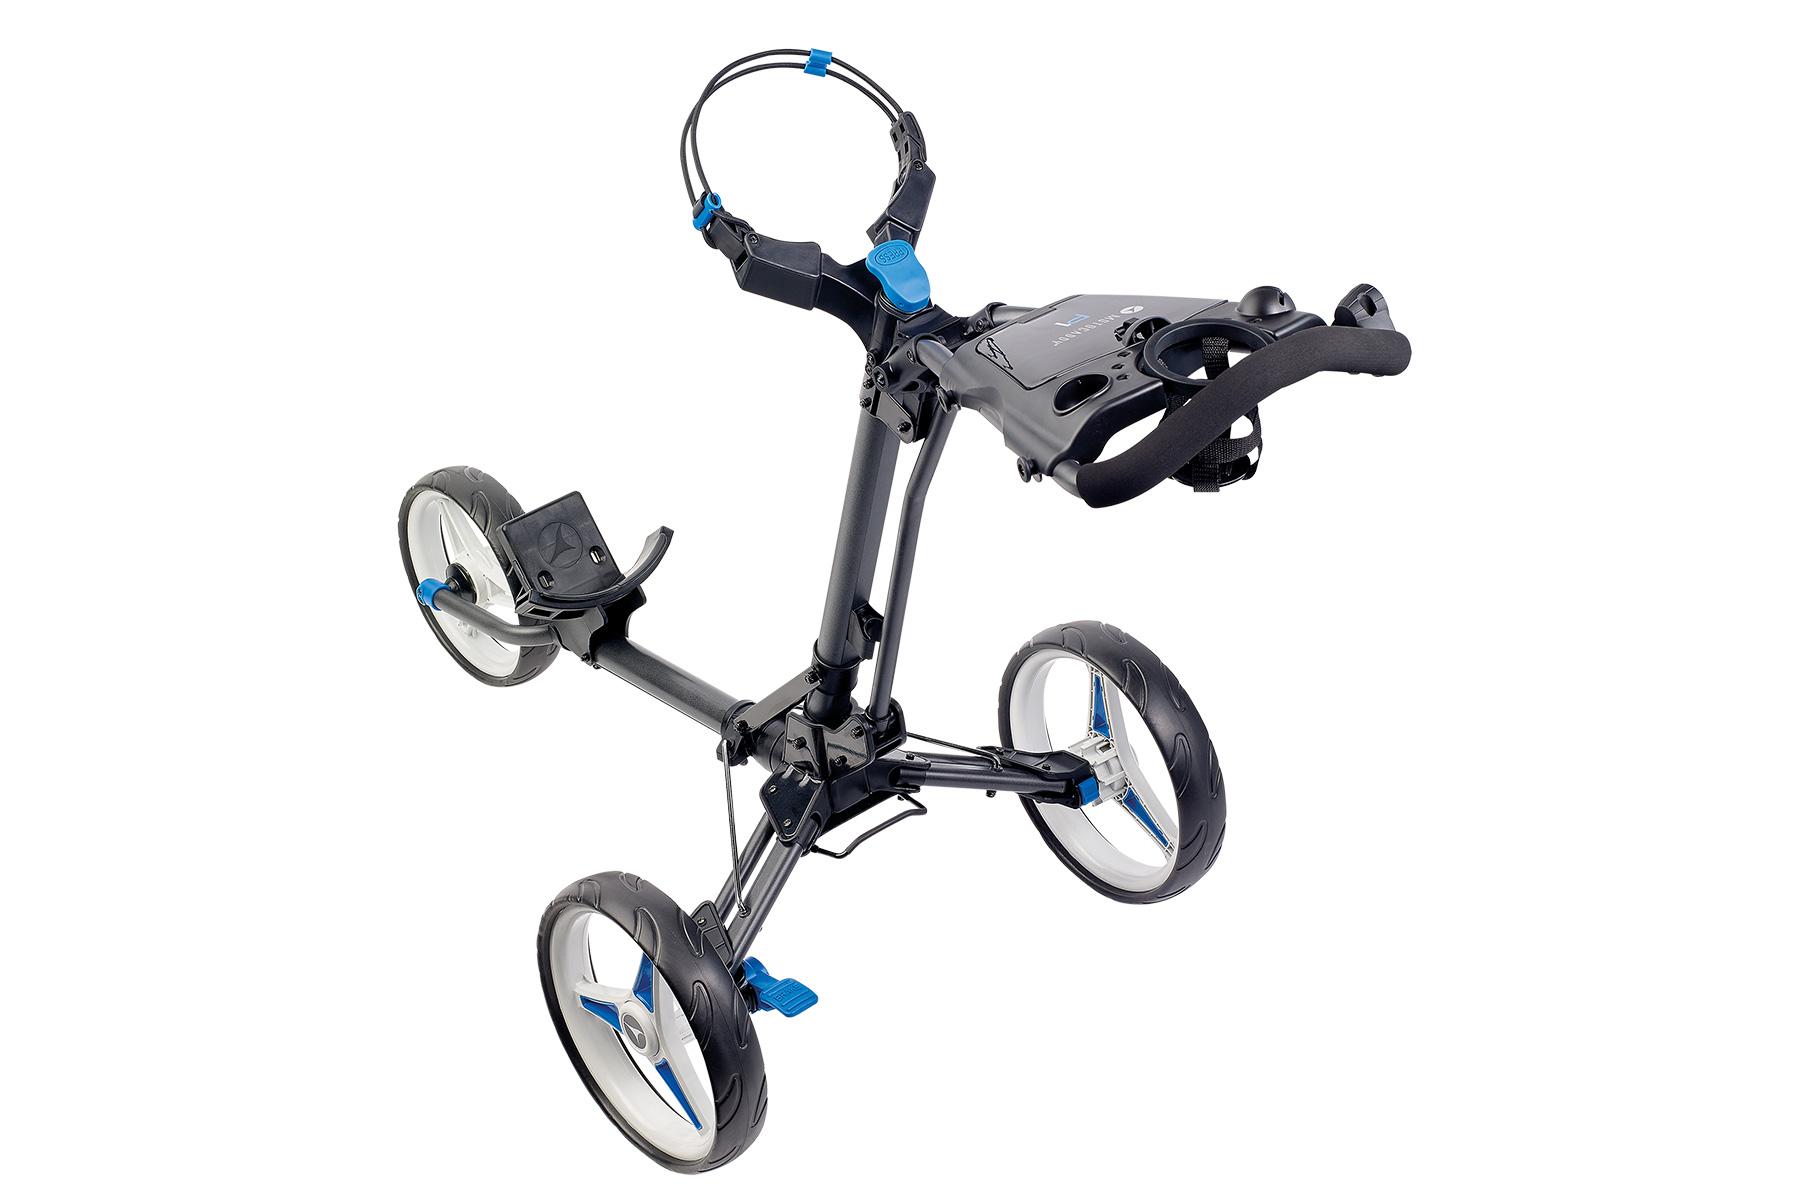 Motocaddy P1 Push Trolley from american golf